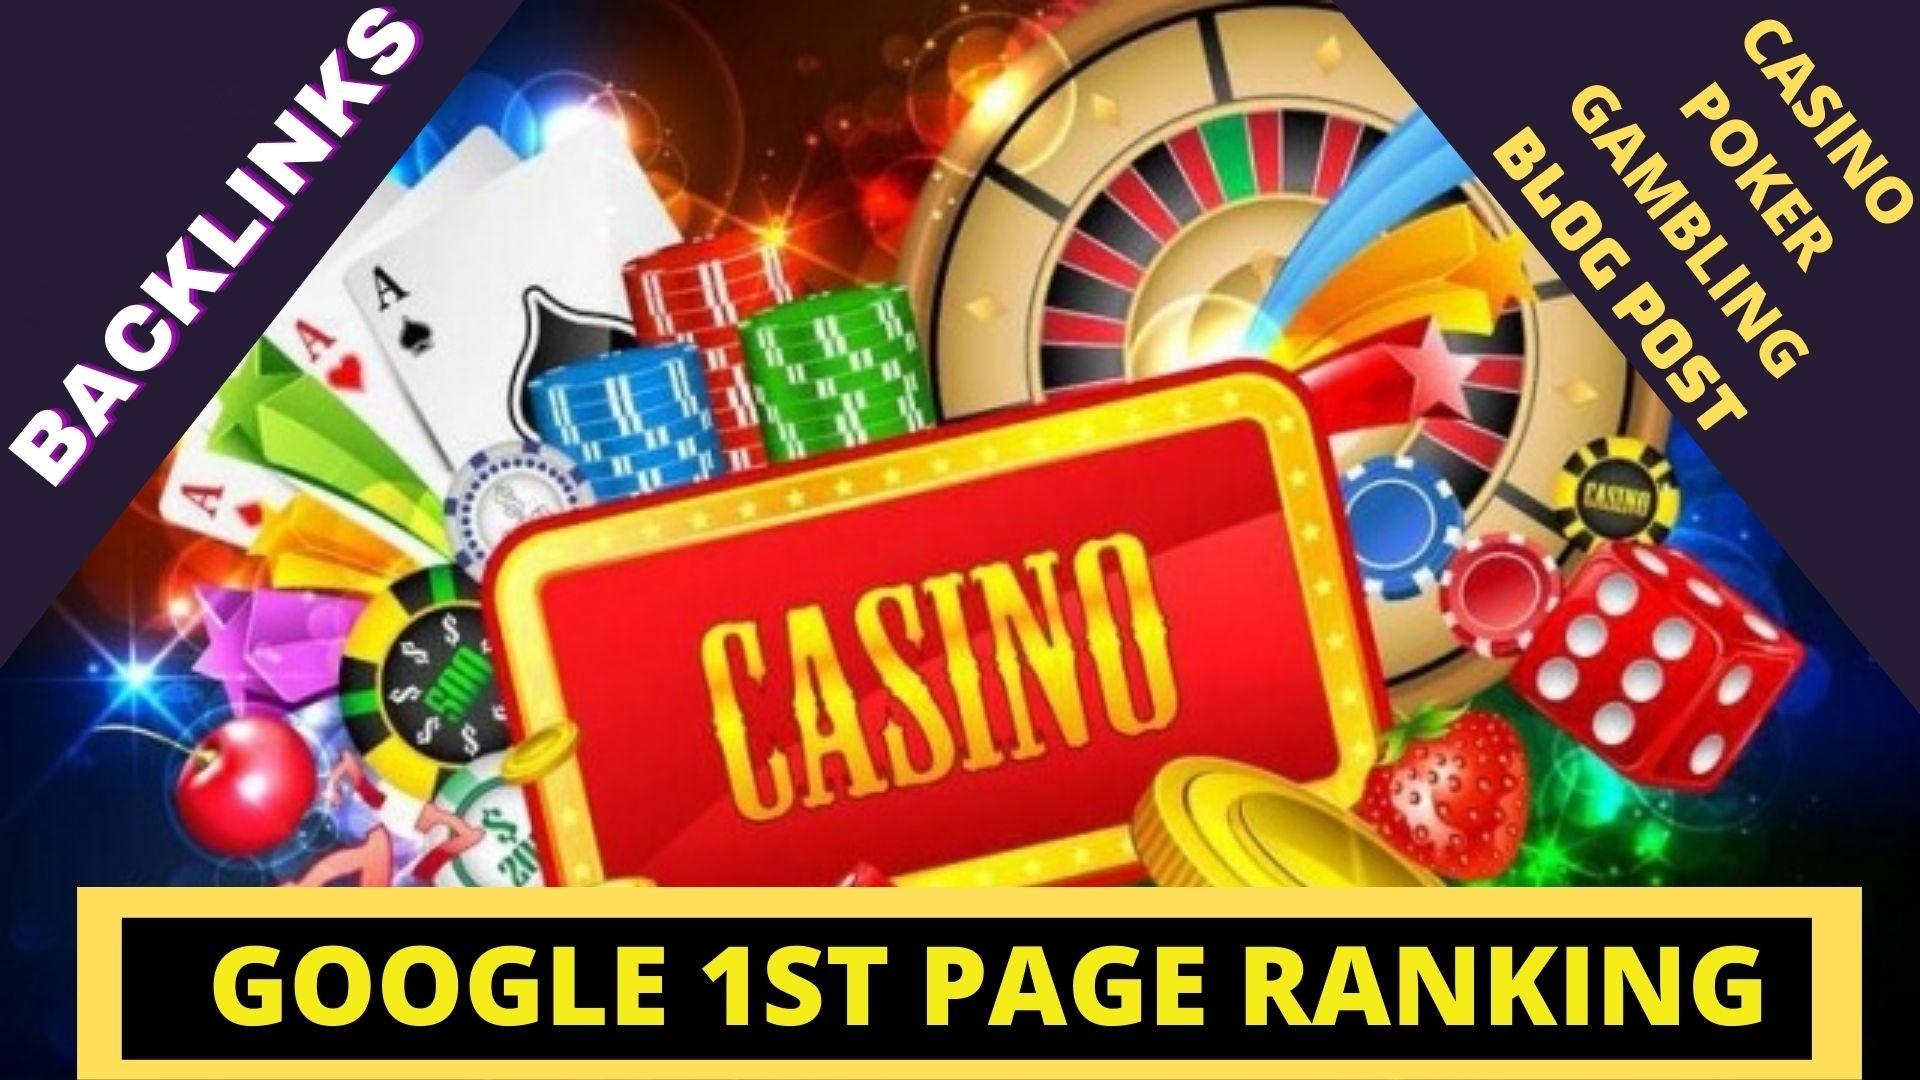 Rank Boost On-1st 150+ CASINO/GAMBLING/POKER Niche PBNs & Profile Tier-2 For Google ranking